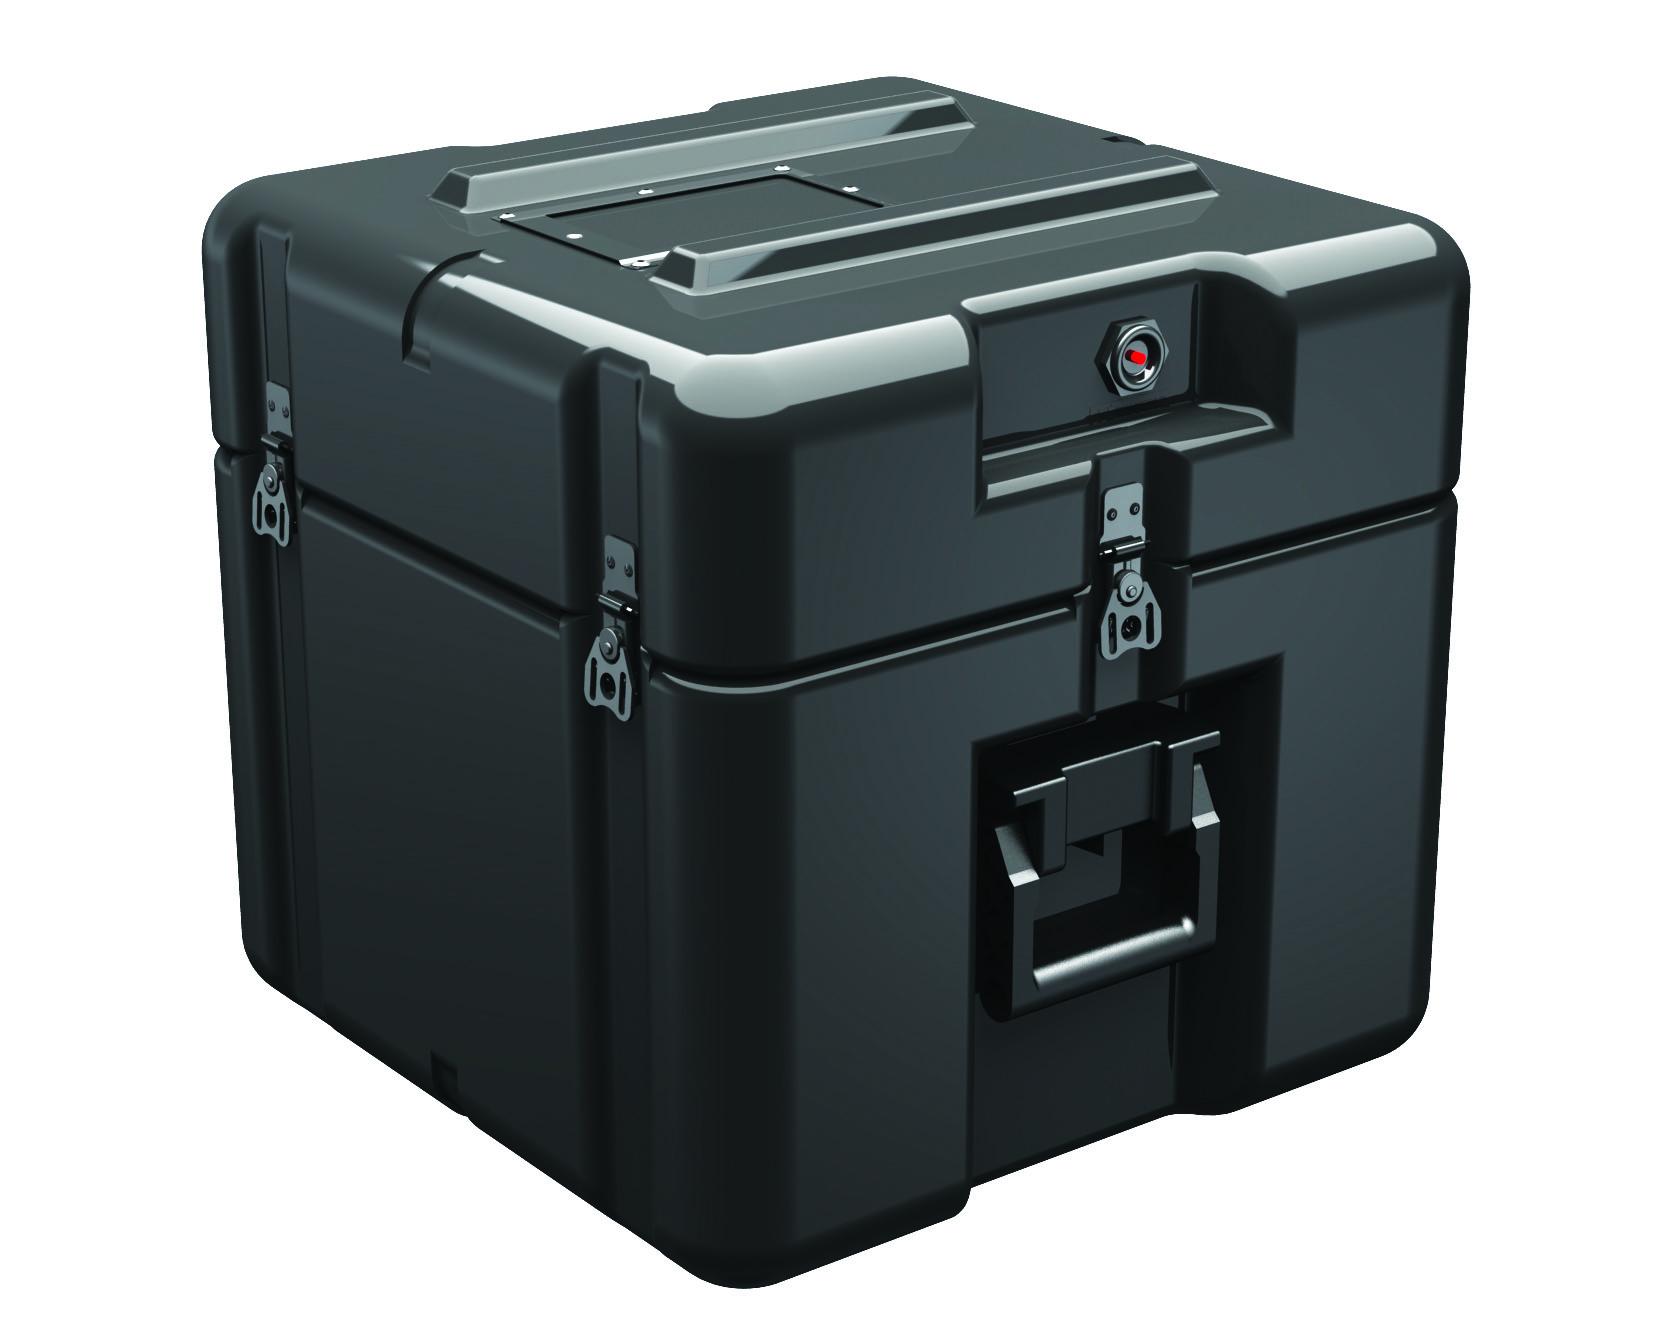 AL1616-1205 -  AL1616-1205 Hardigg Cases Transport Cases